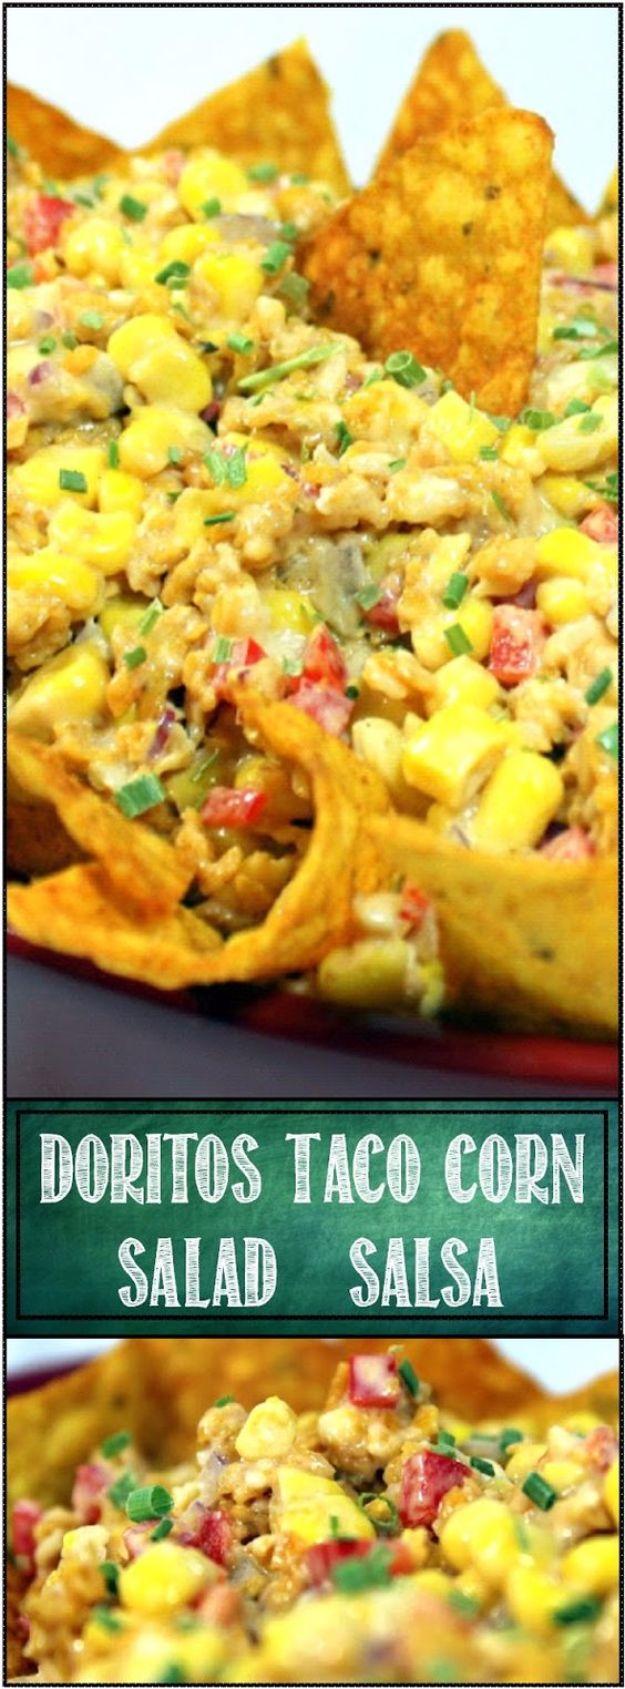 DIY Recipes Made With Doritos - Doritos Taco Corn Salsa Salad - Best Dorito Recipes for Casserole, Taco Salad, Chicken Dinners, Beef Casseroles, Nachos, Easy Cool Ranch Meals and Ideas for Dips, Snacks and Kids Recipe Tutorials - Quick Lunch Ideas and Recipes for Parties http://diyjoy.com/recipe-ideas-doritos